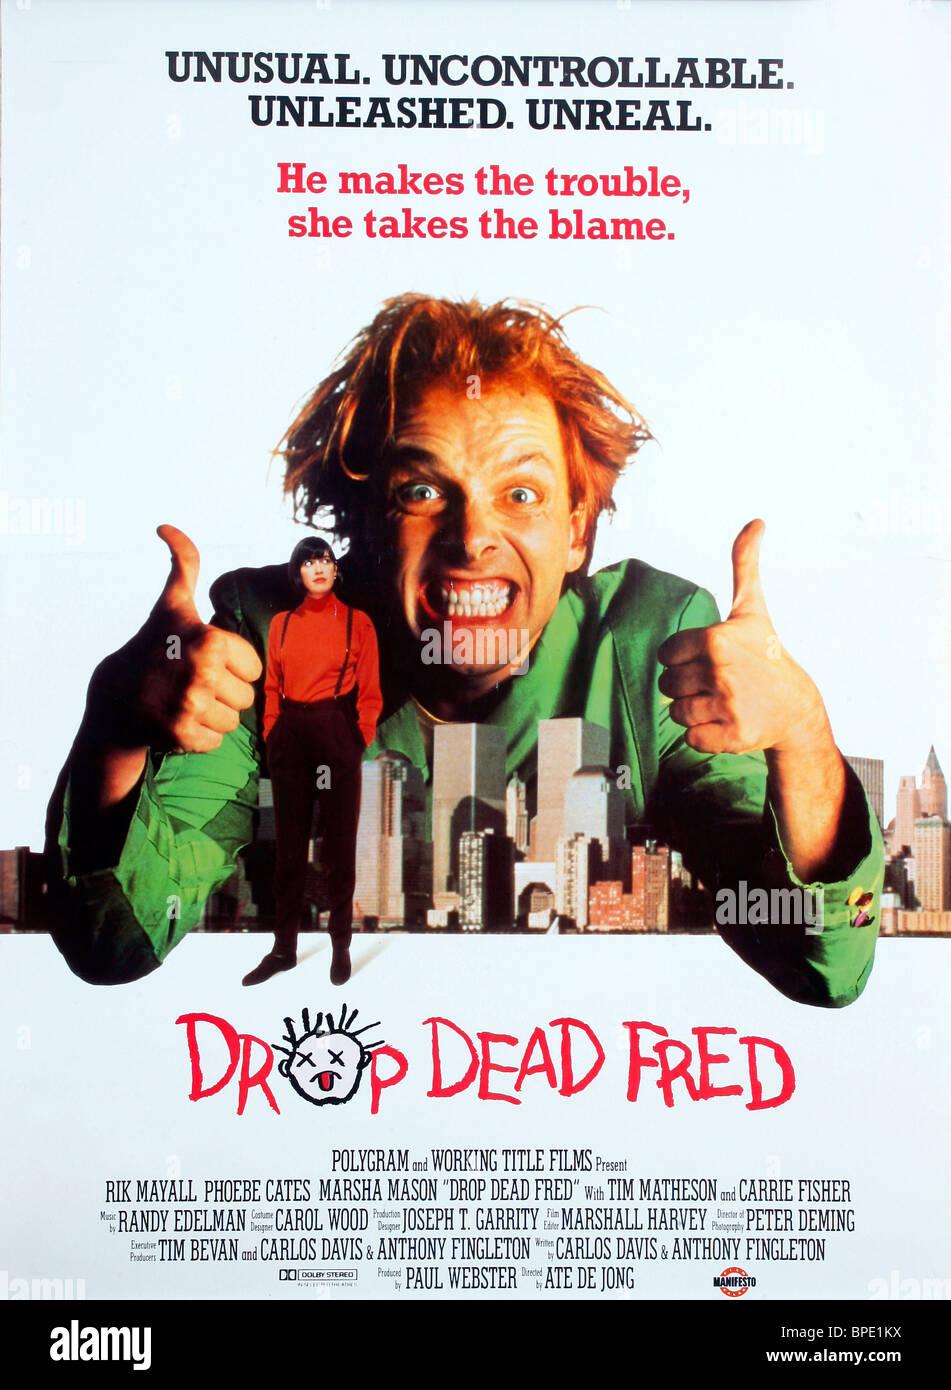 drop dead fred Buy drop dead fred: read 796 movies & tv reviews - amazoncom.